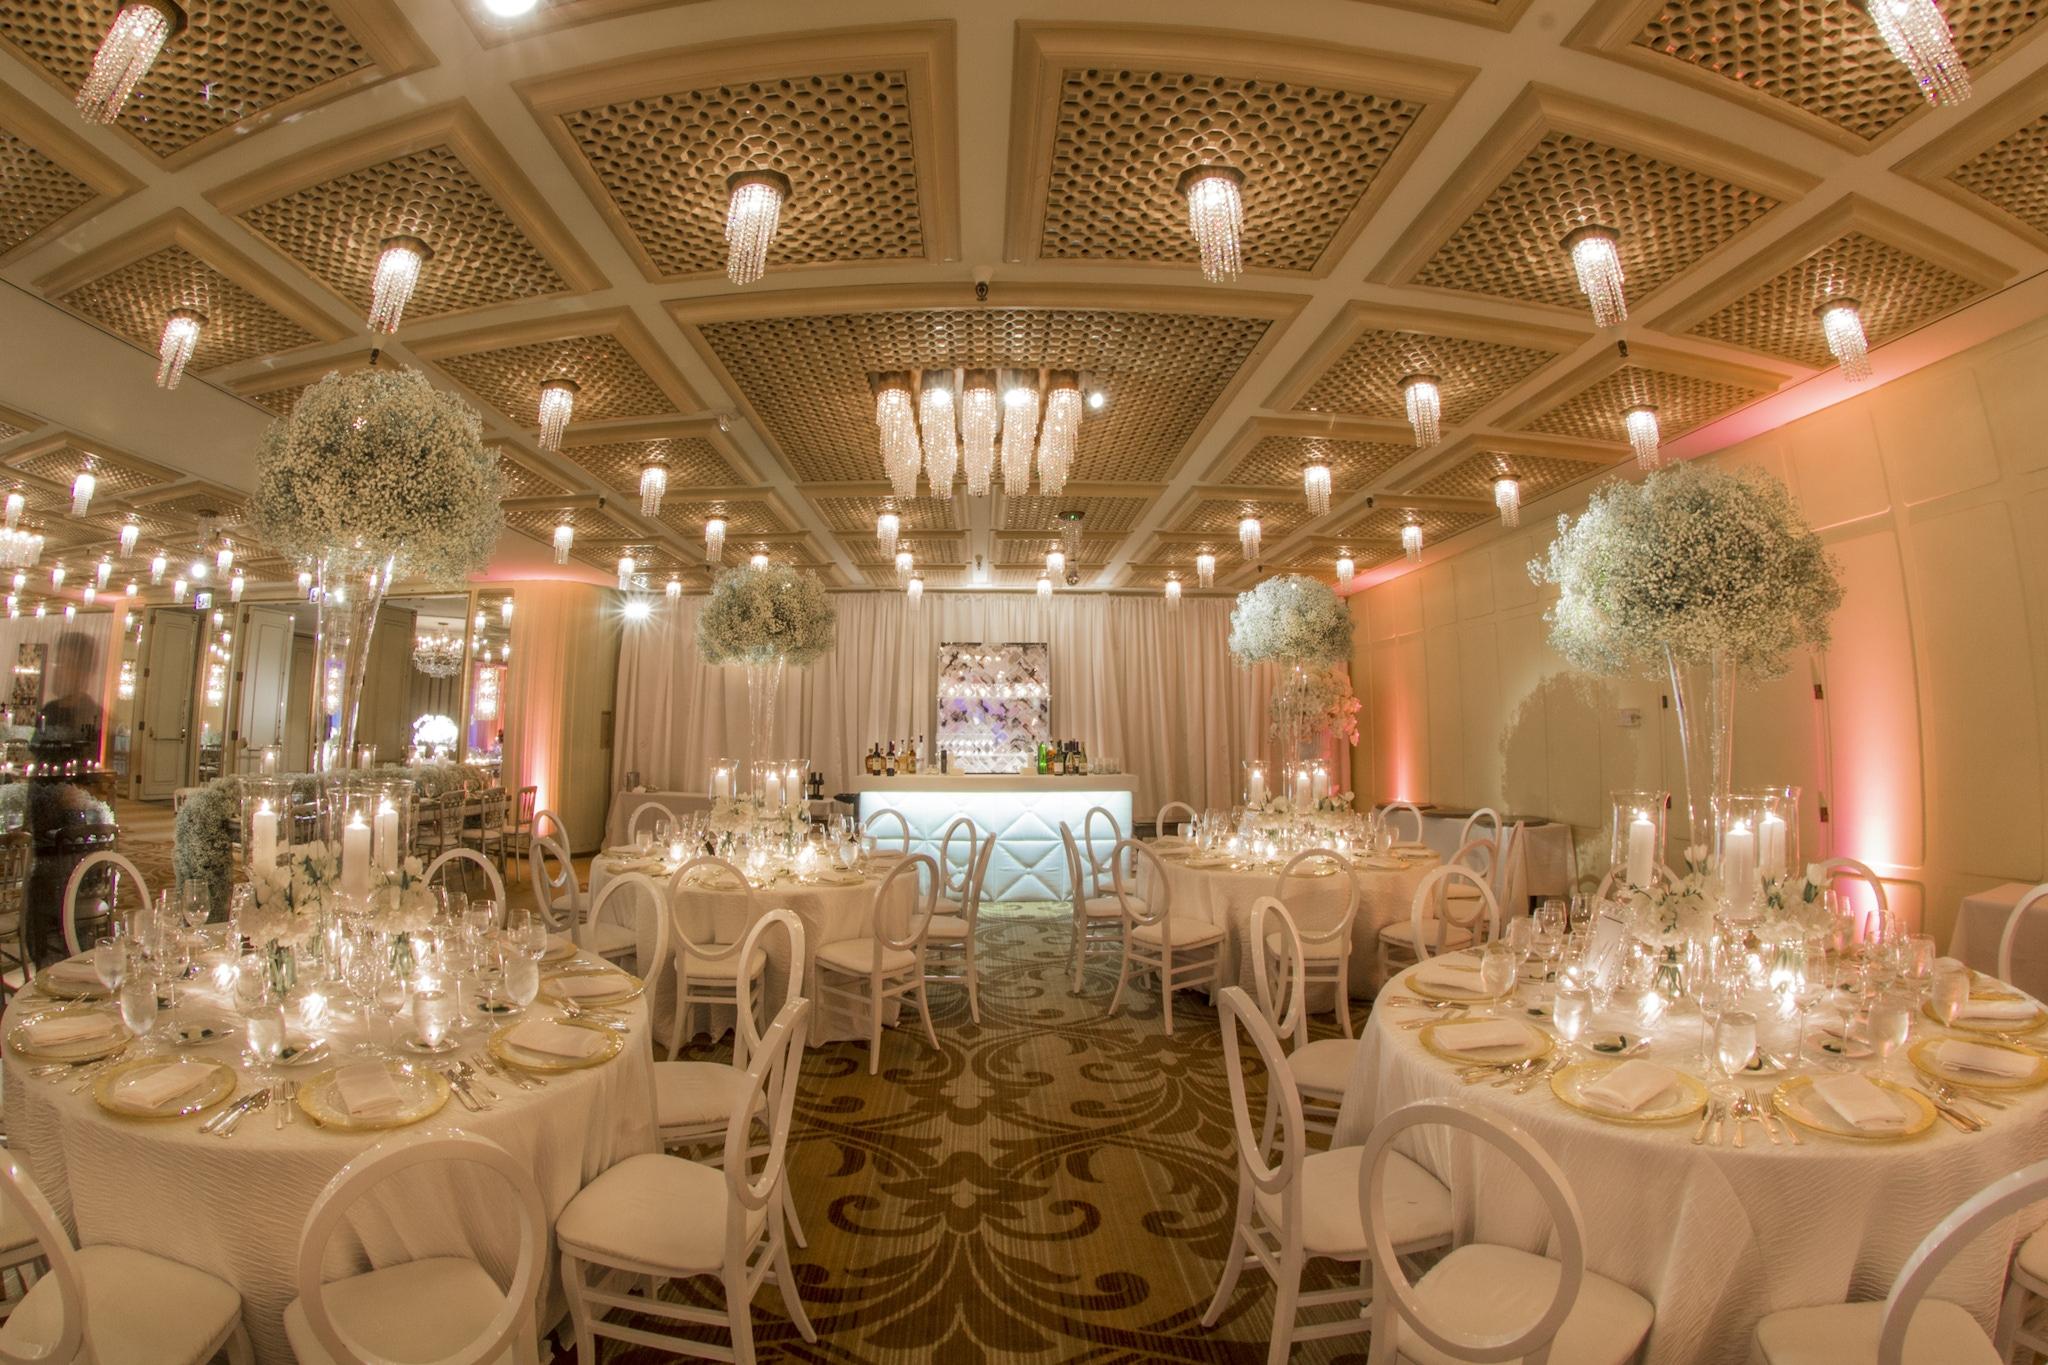 Best Chicago ballrooms - THE RITZ-CARLTON CHICAGO